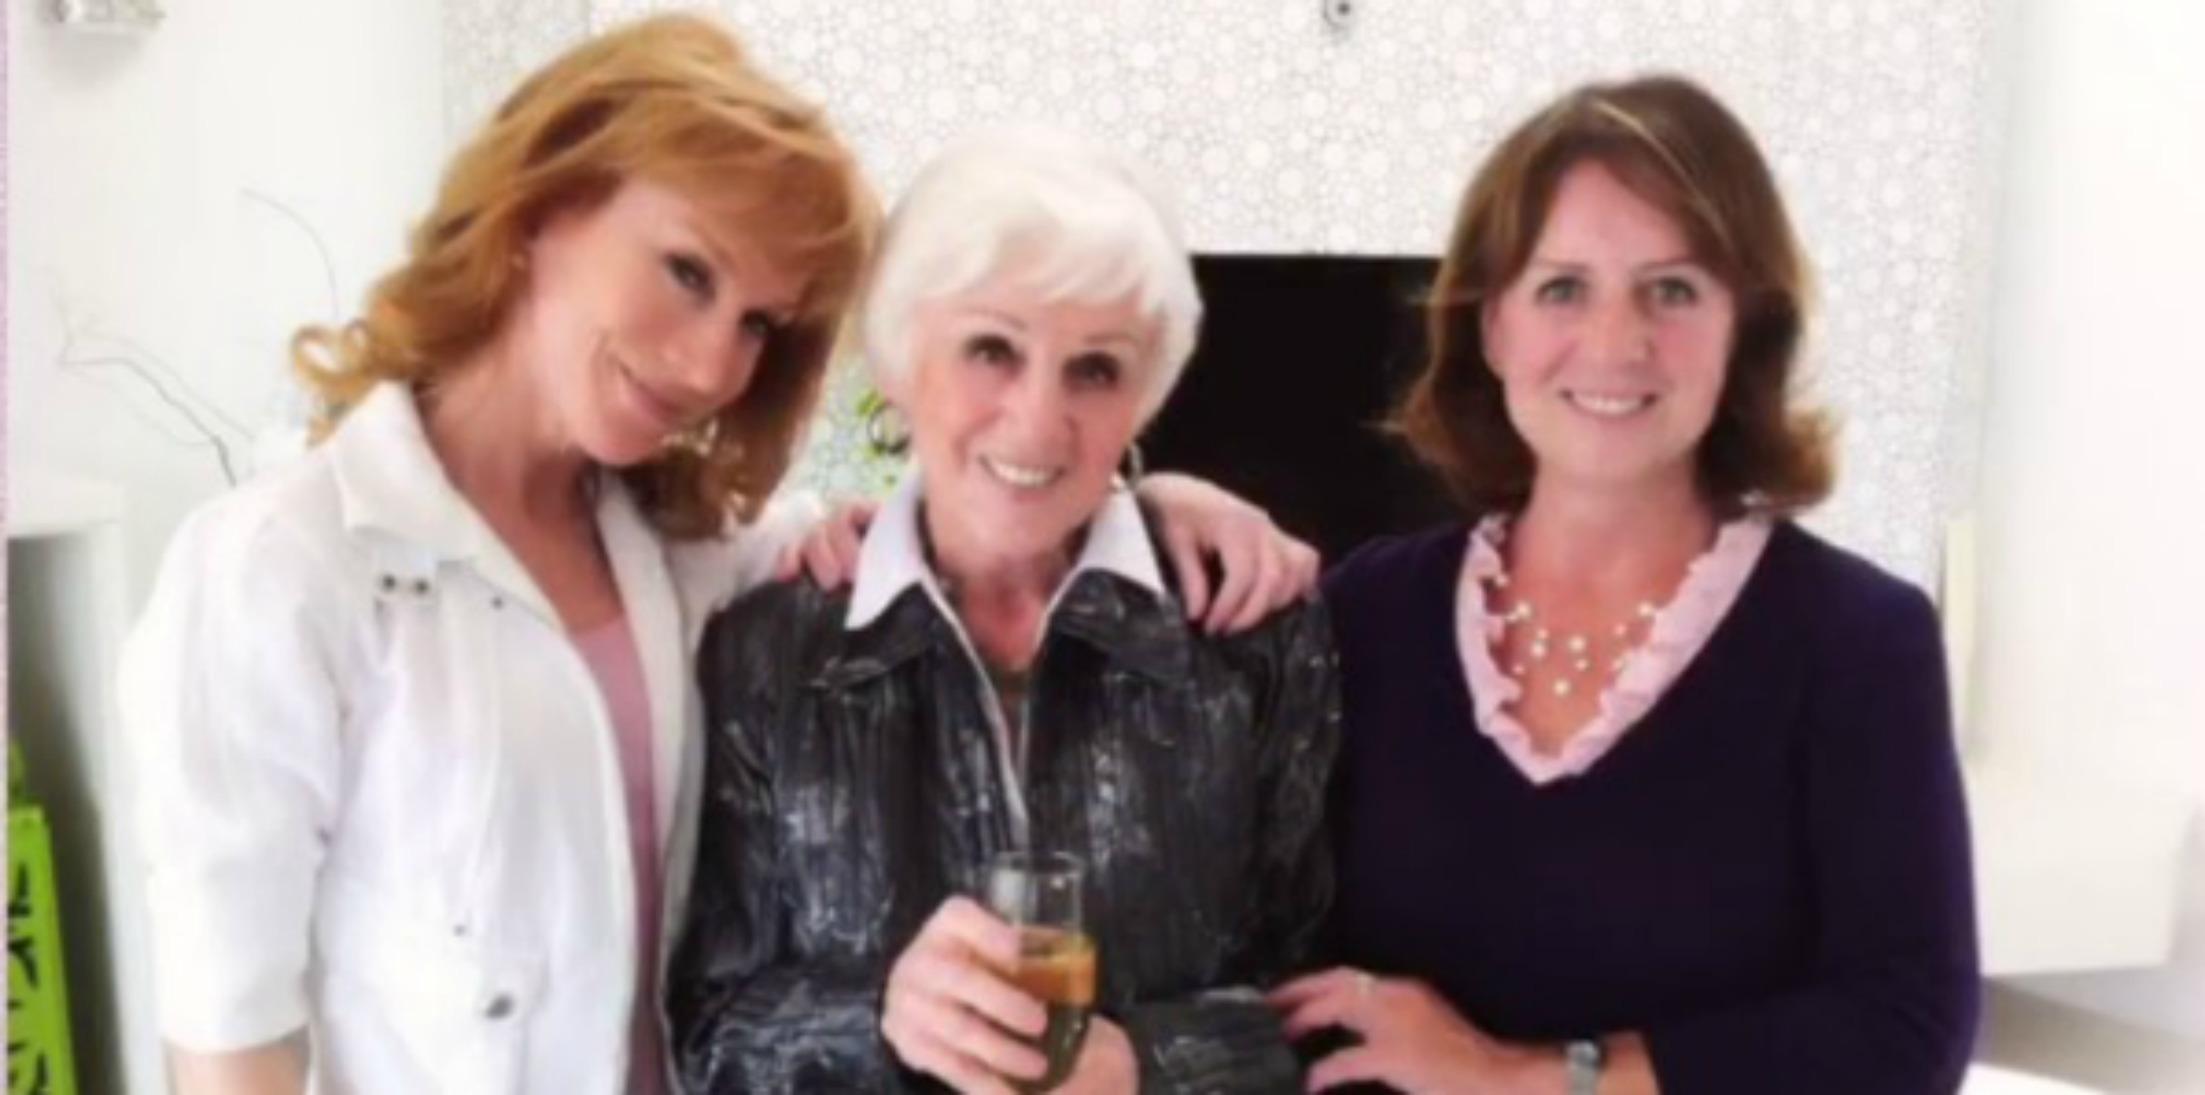 kathy griffin sister dead cancer battle long